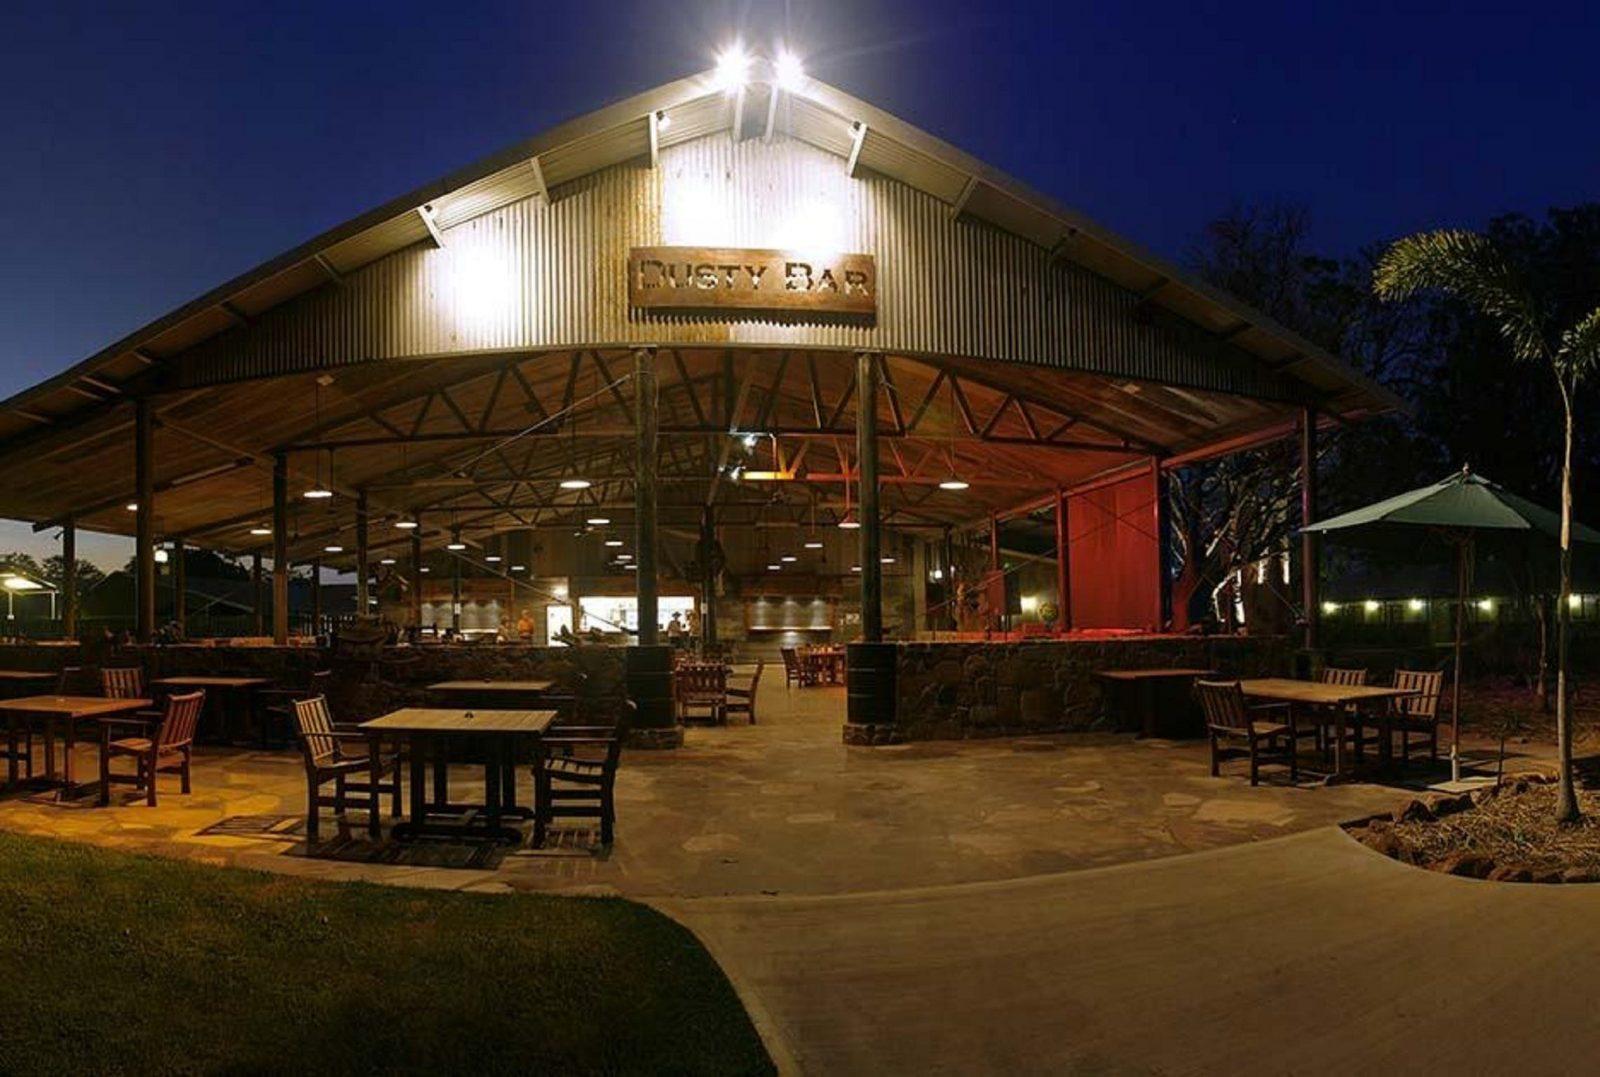 The Dusty Bar and Grill, Kununurra, Western Australia